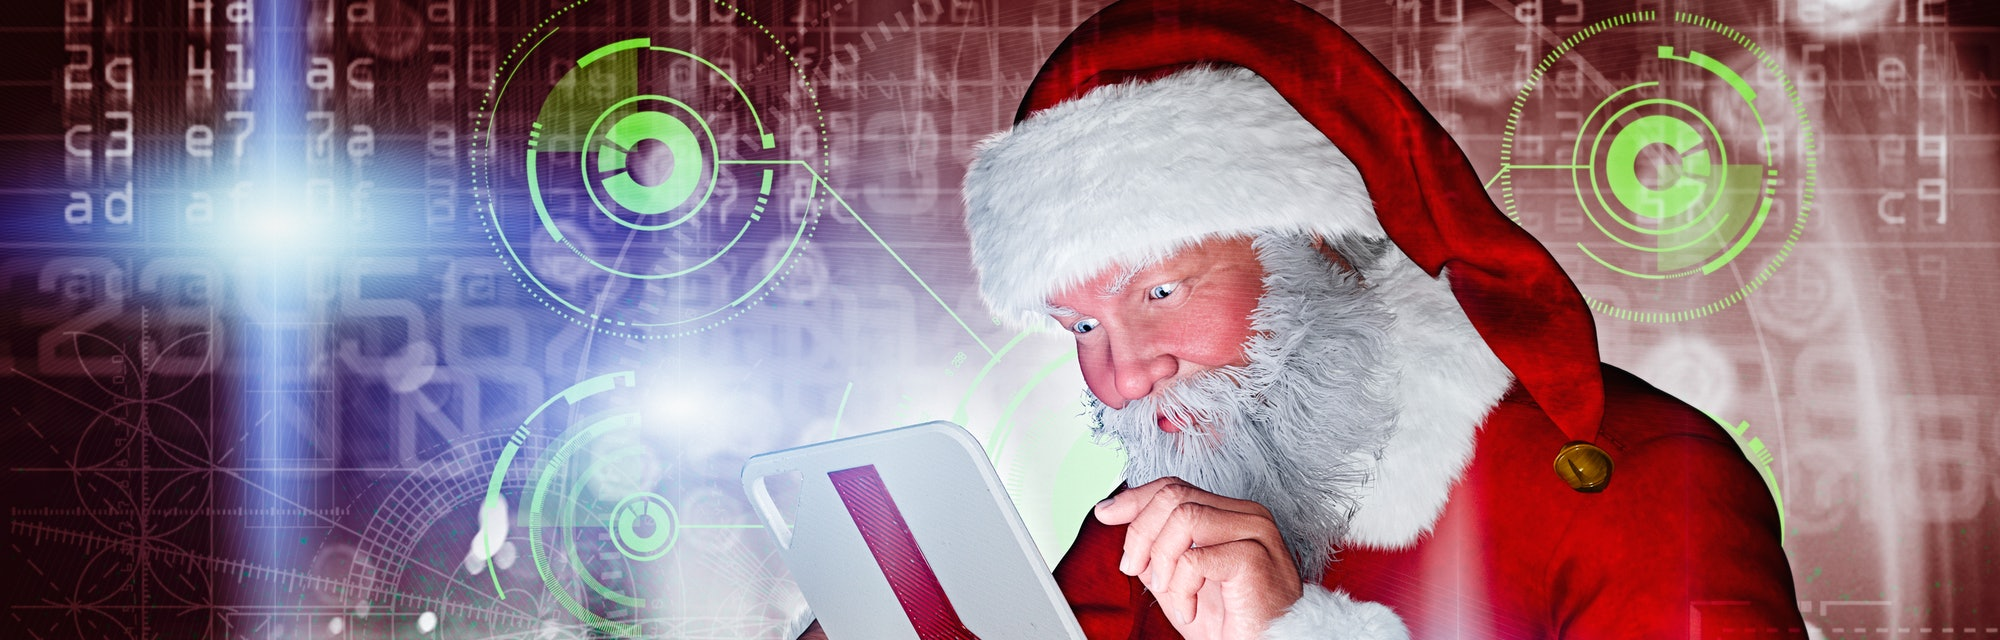 creepy santa holds an ipad in a dystopian future